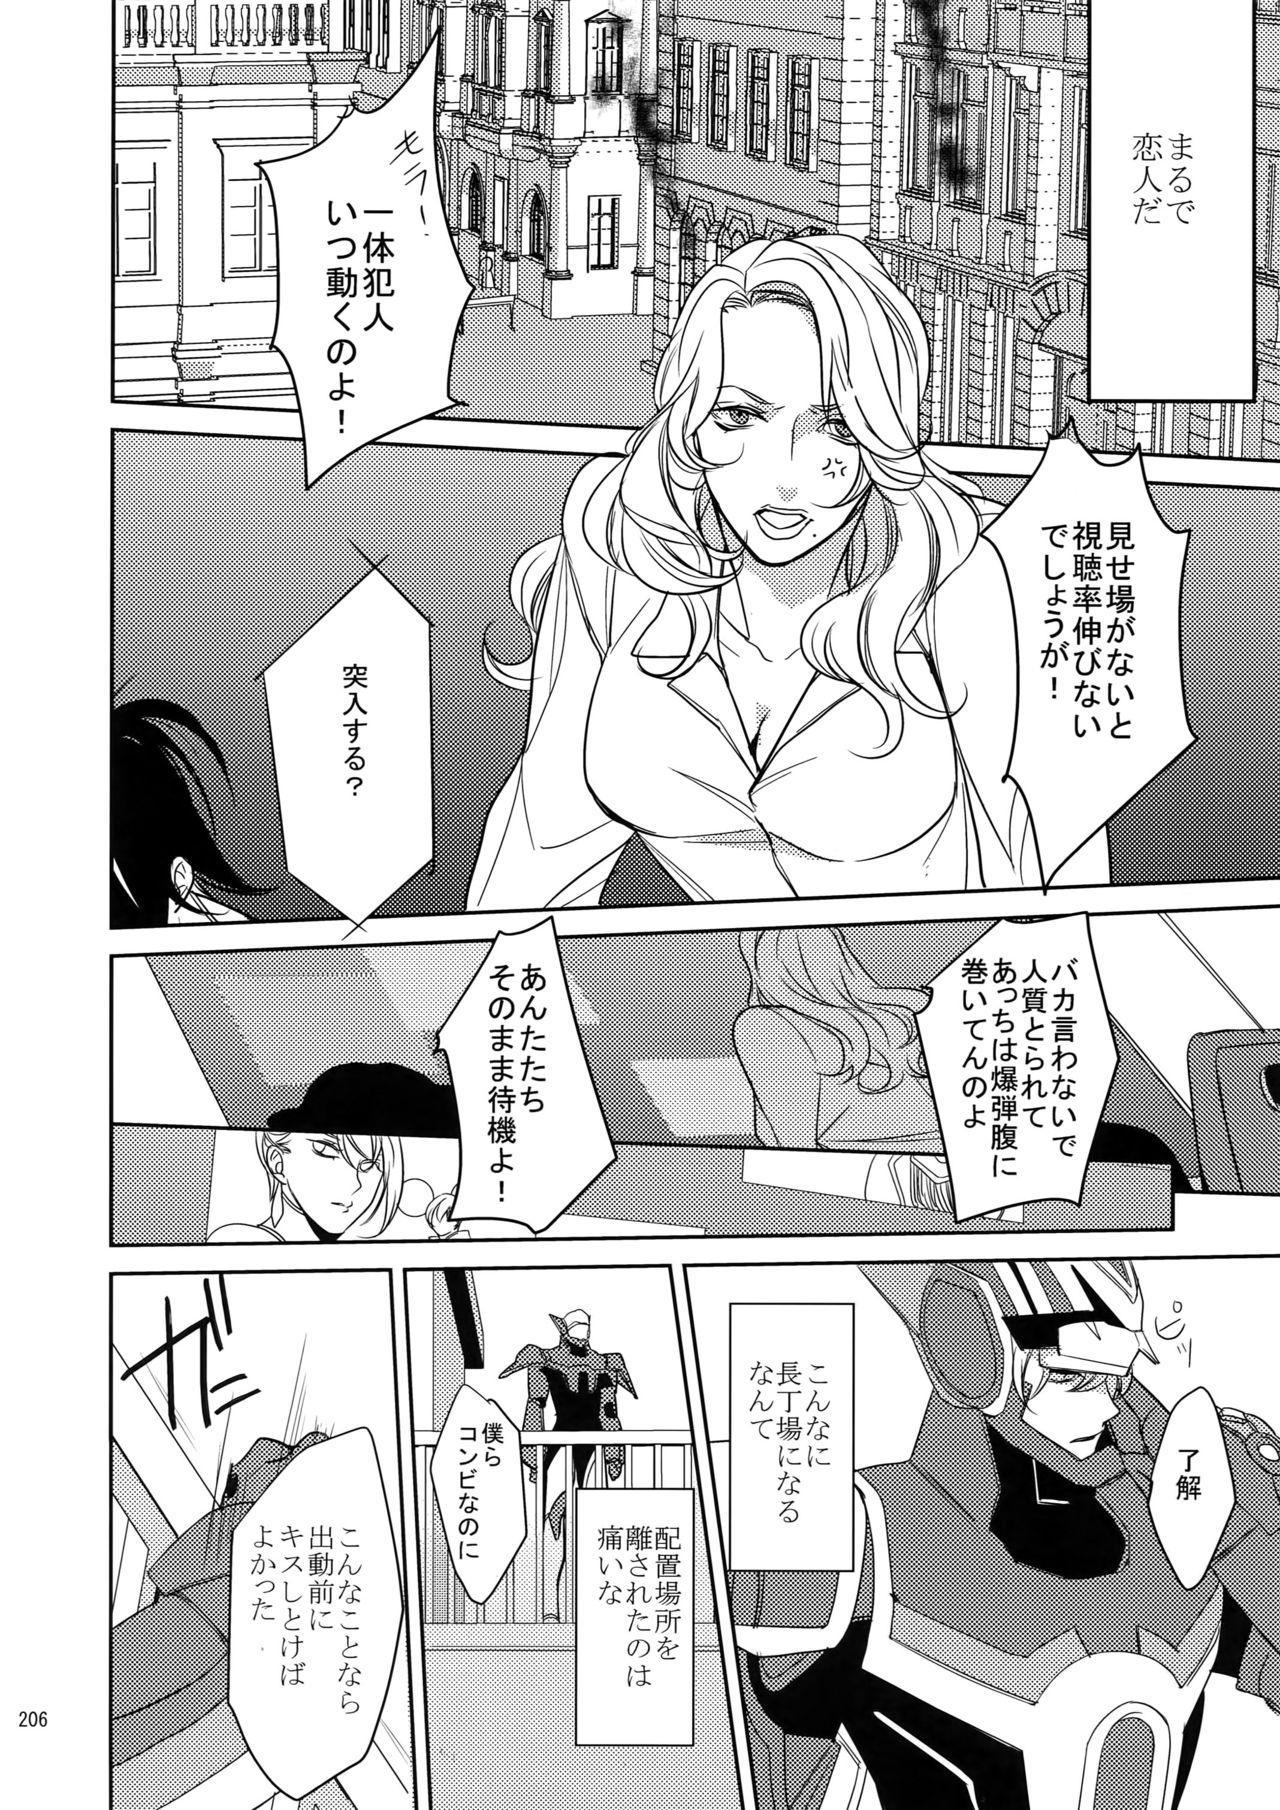 BOROZS Usagi Tora Sairoku 204